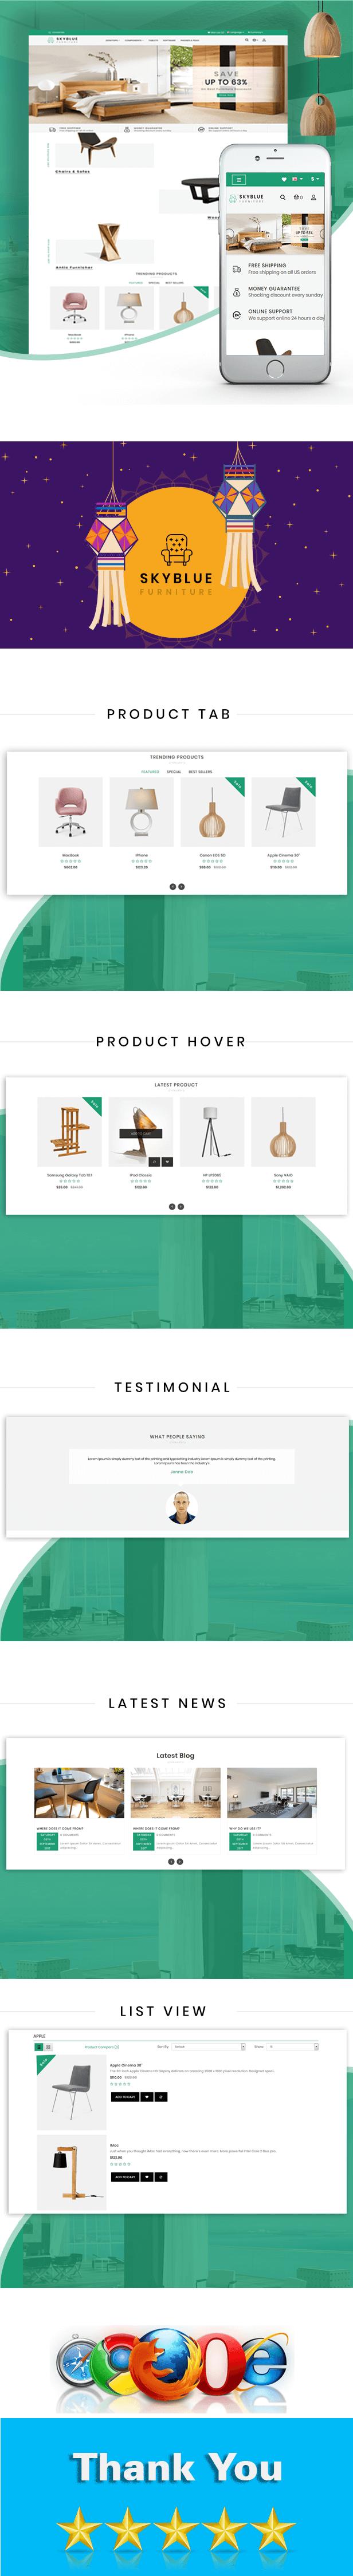 Skyblue Furniture OpenCart 3.x Responsive Theme - 1